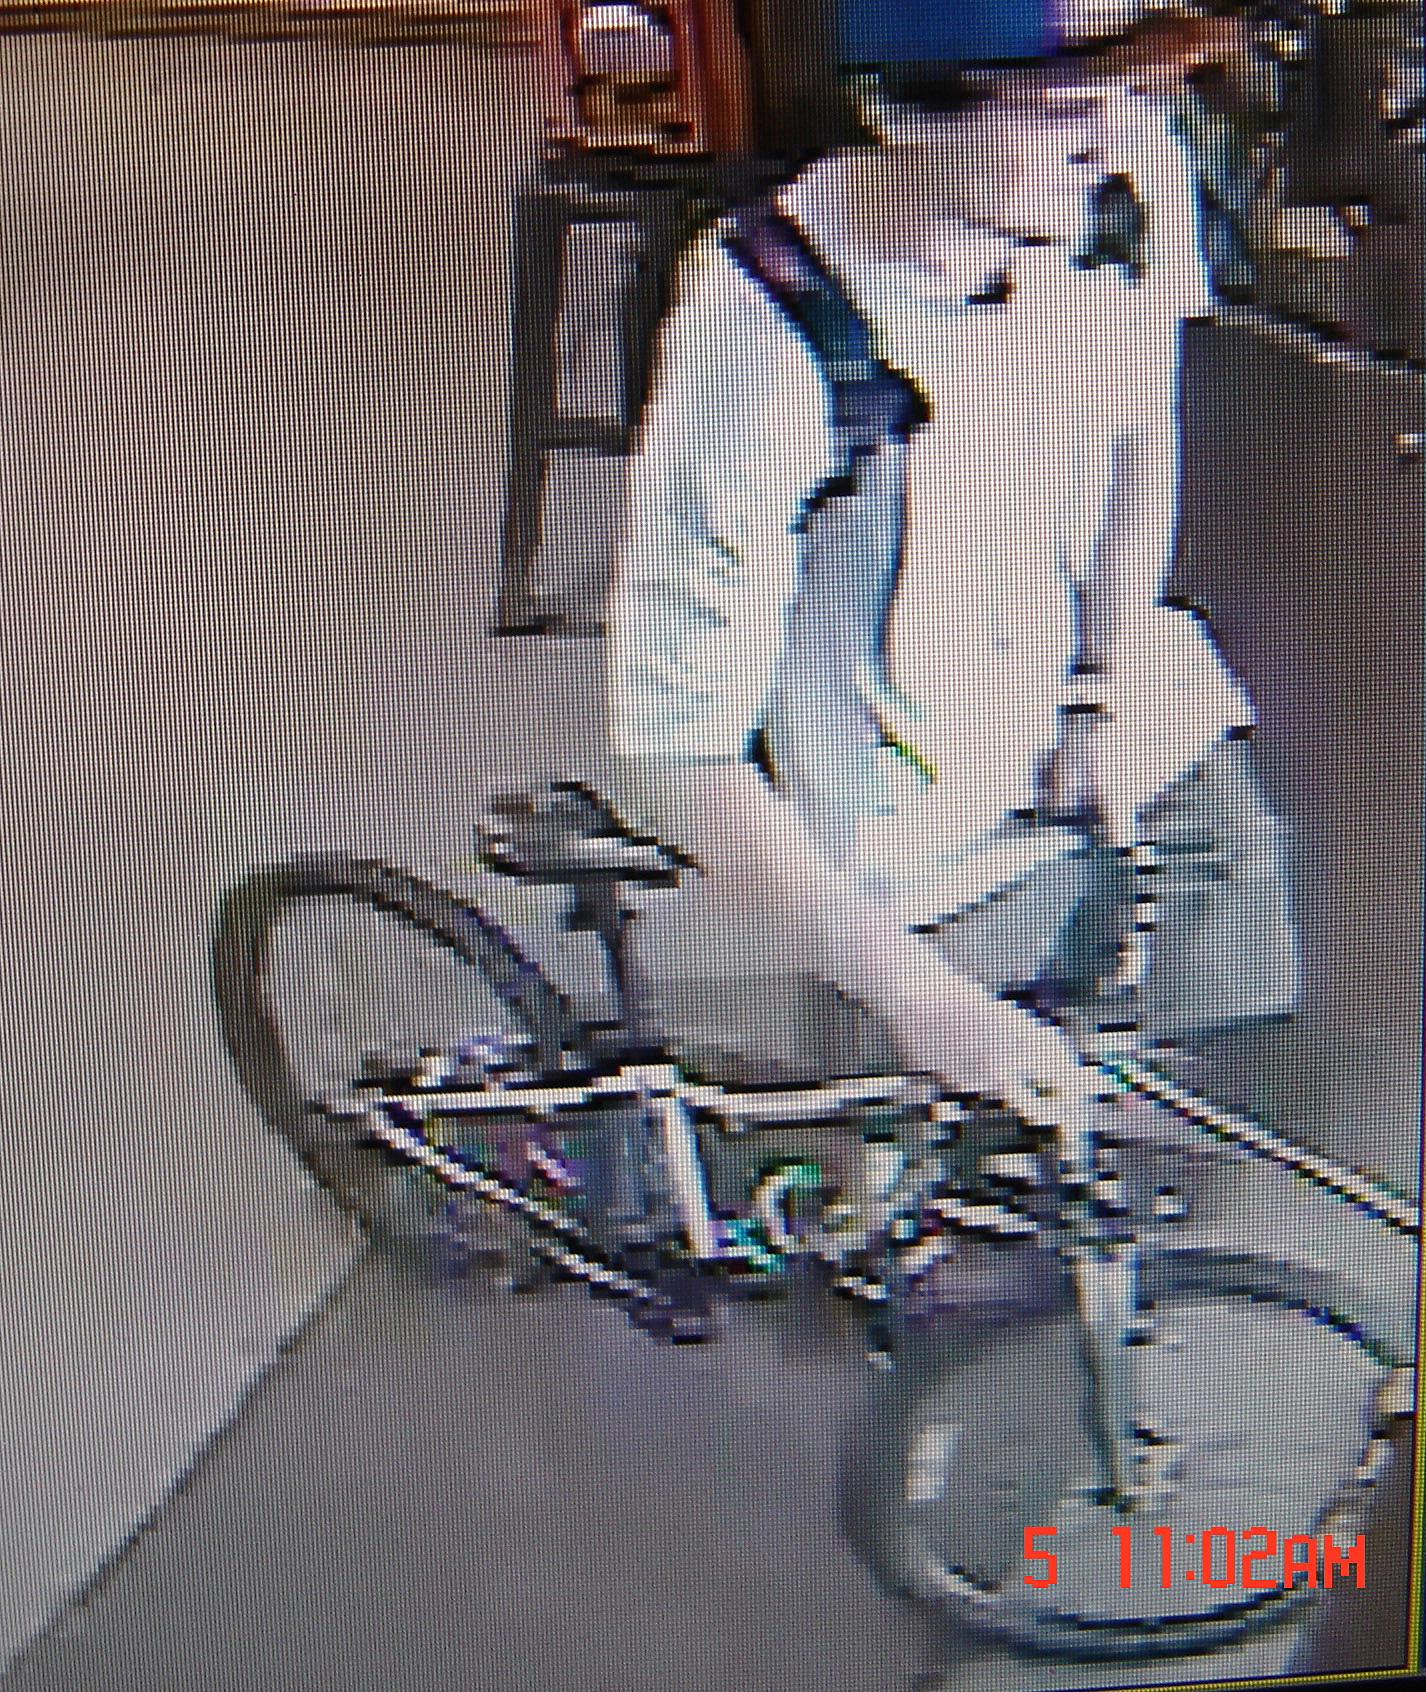 Stolen bike and suspect